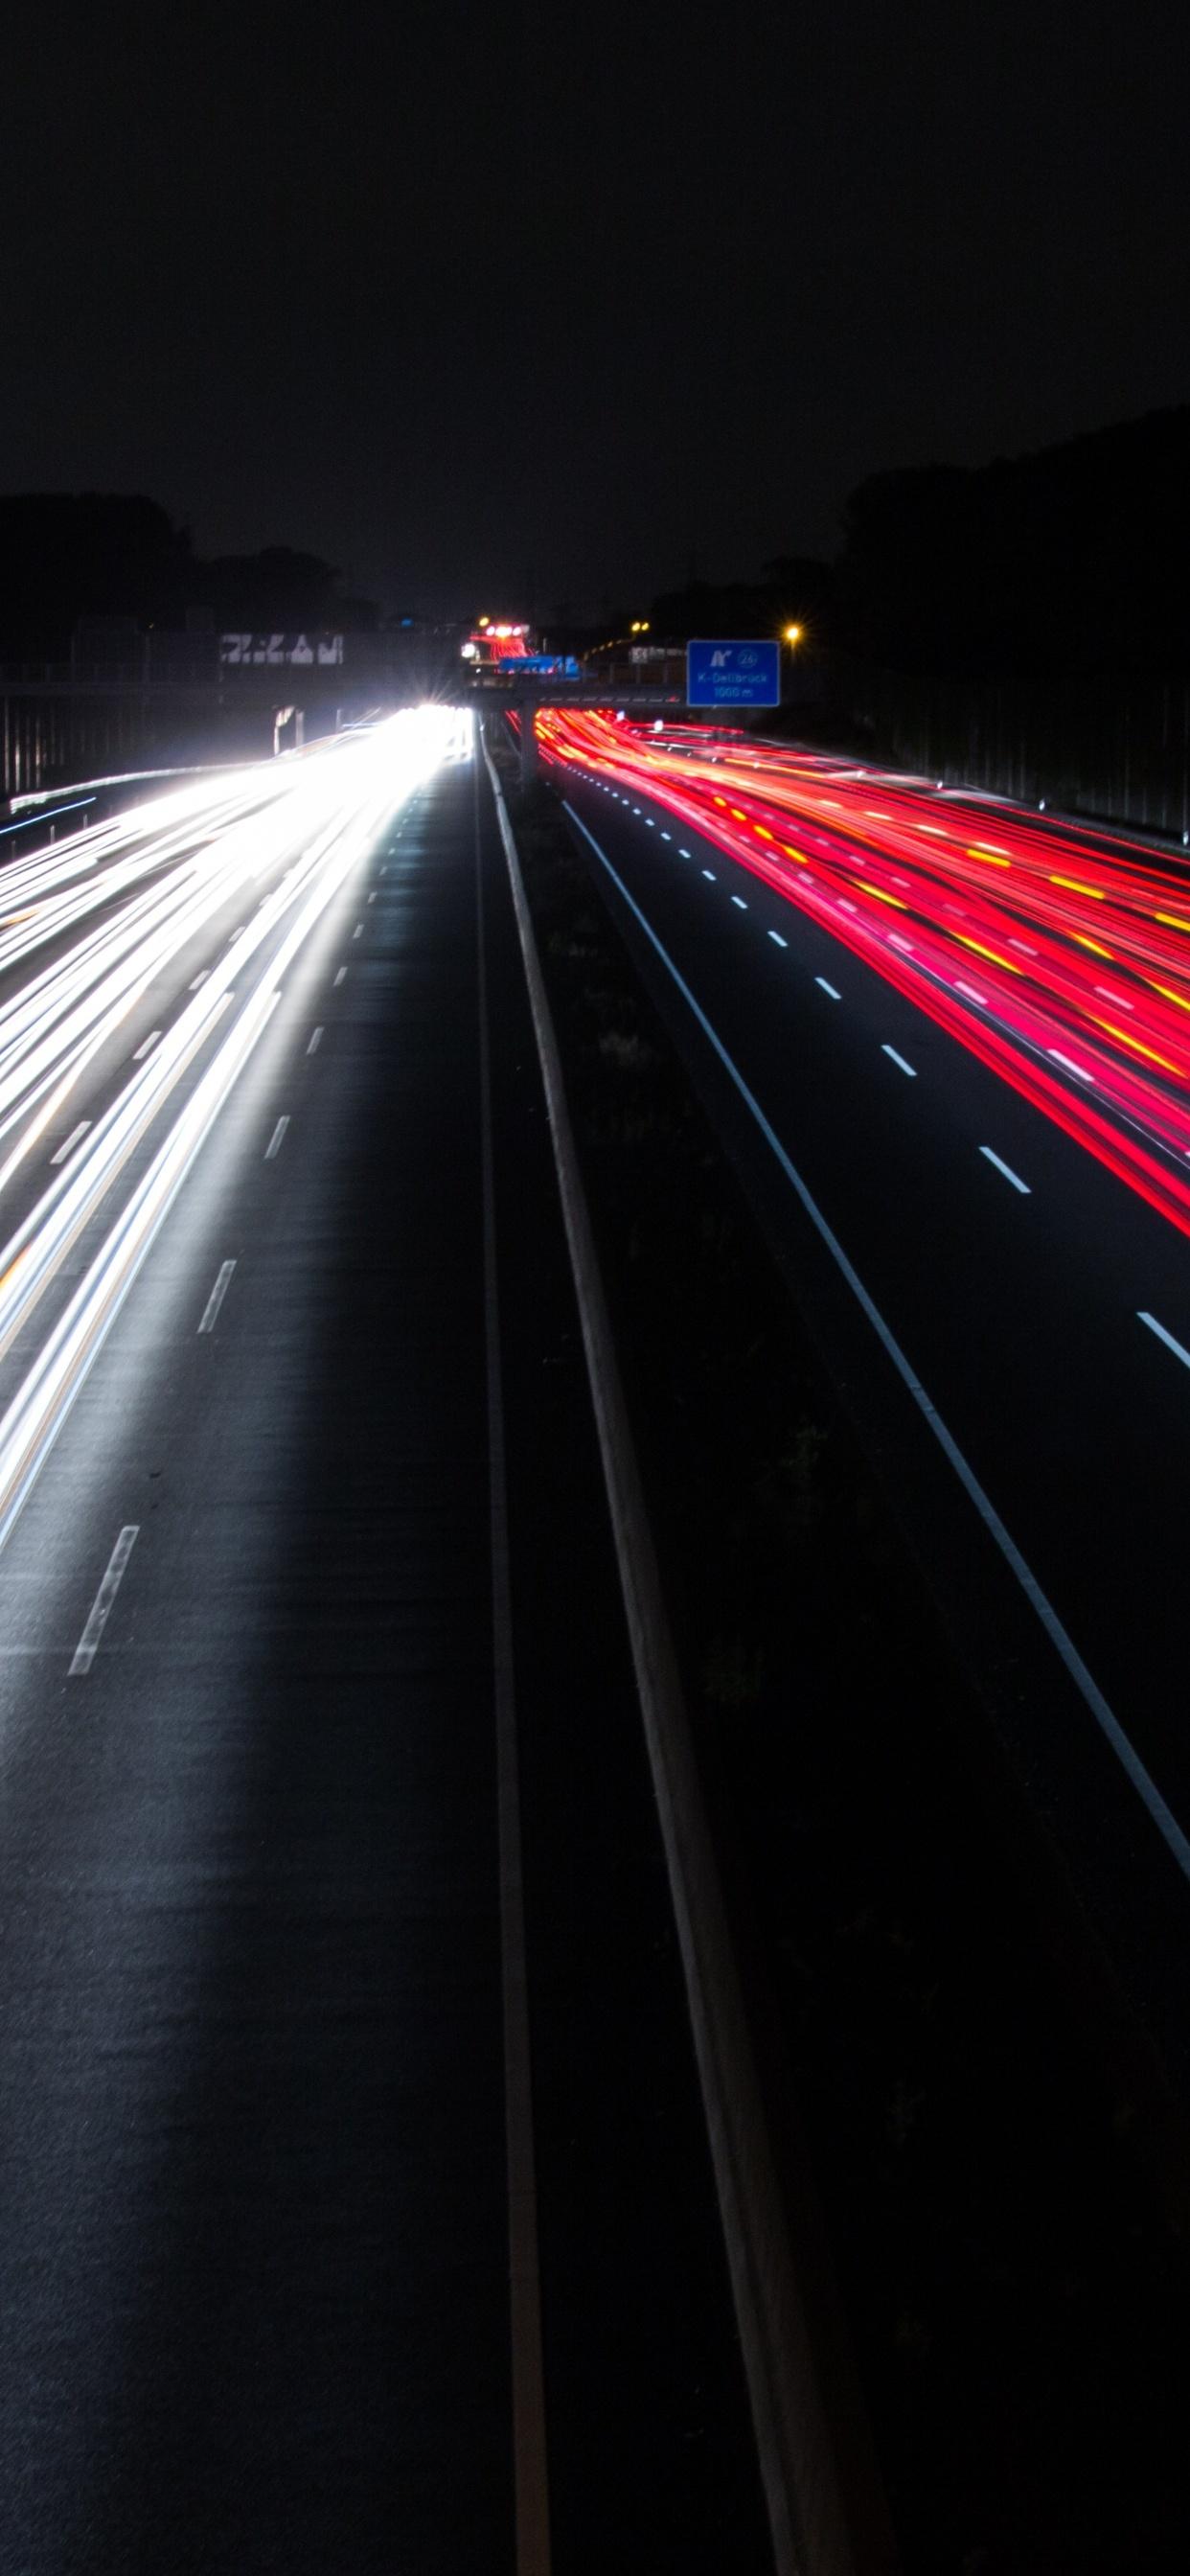 long-exposure-road-photography-5k-zx.jpg